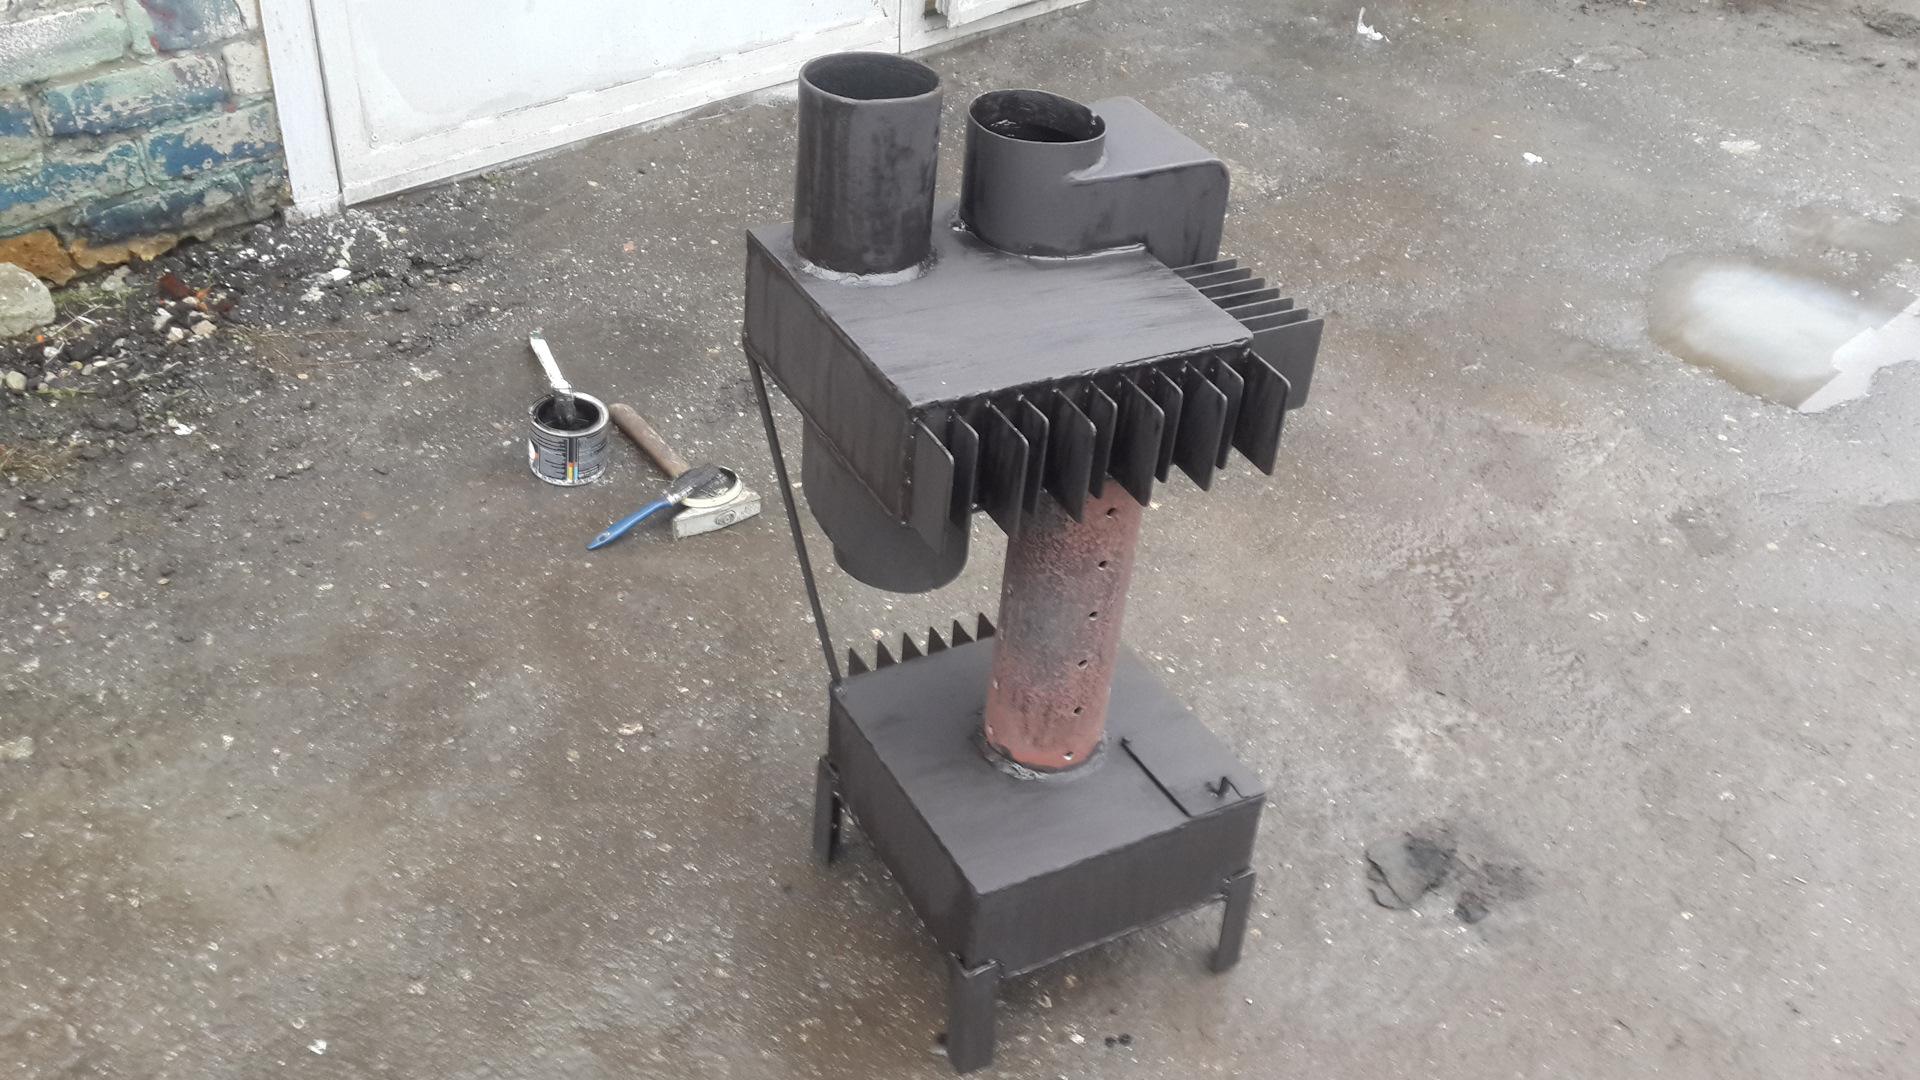 Печка на отработке своими руками фото